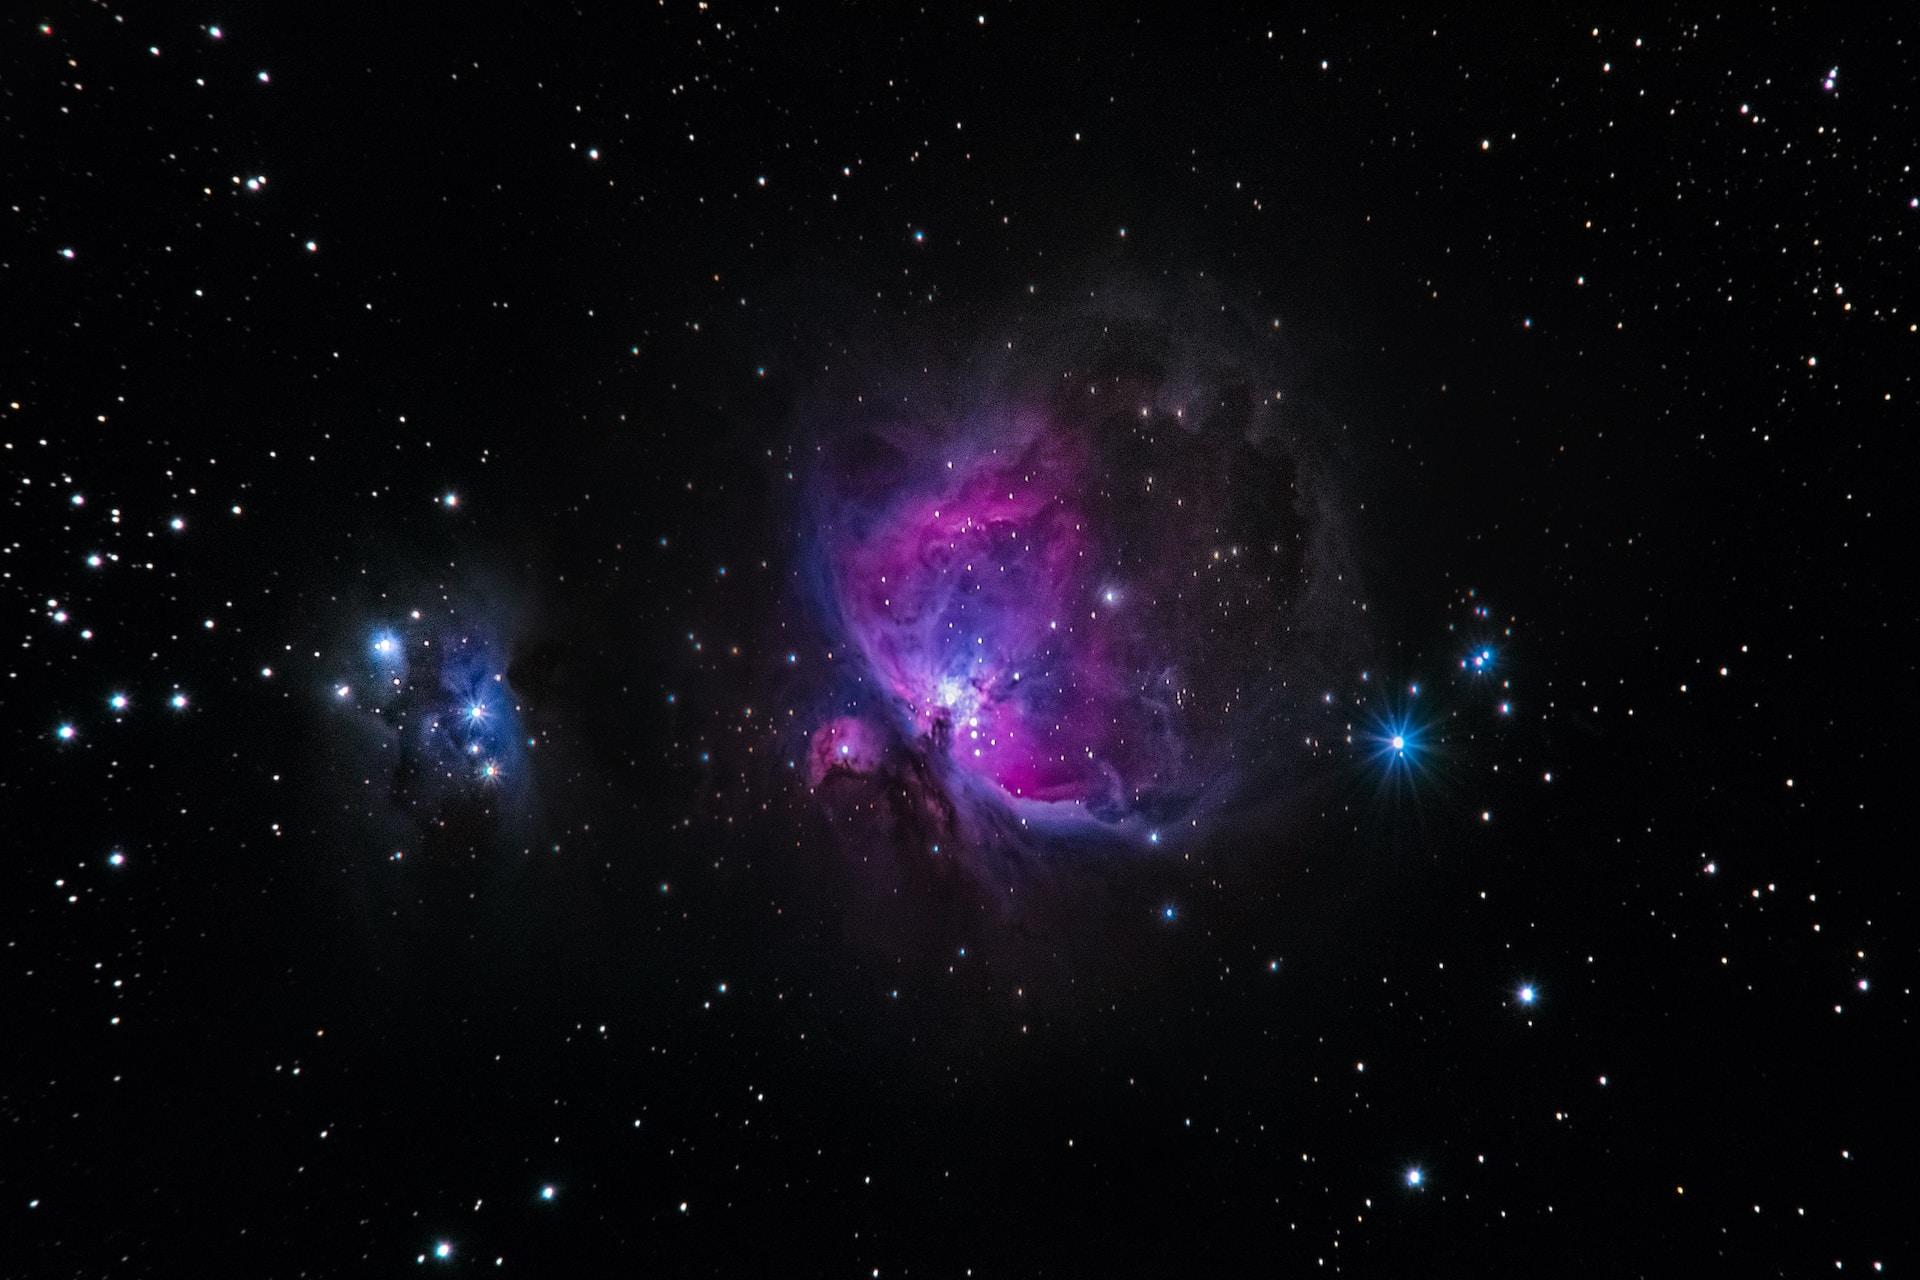 nebula in galaxy